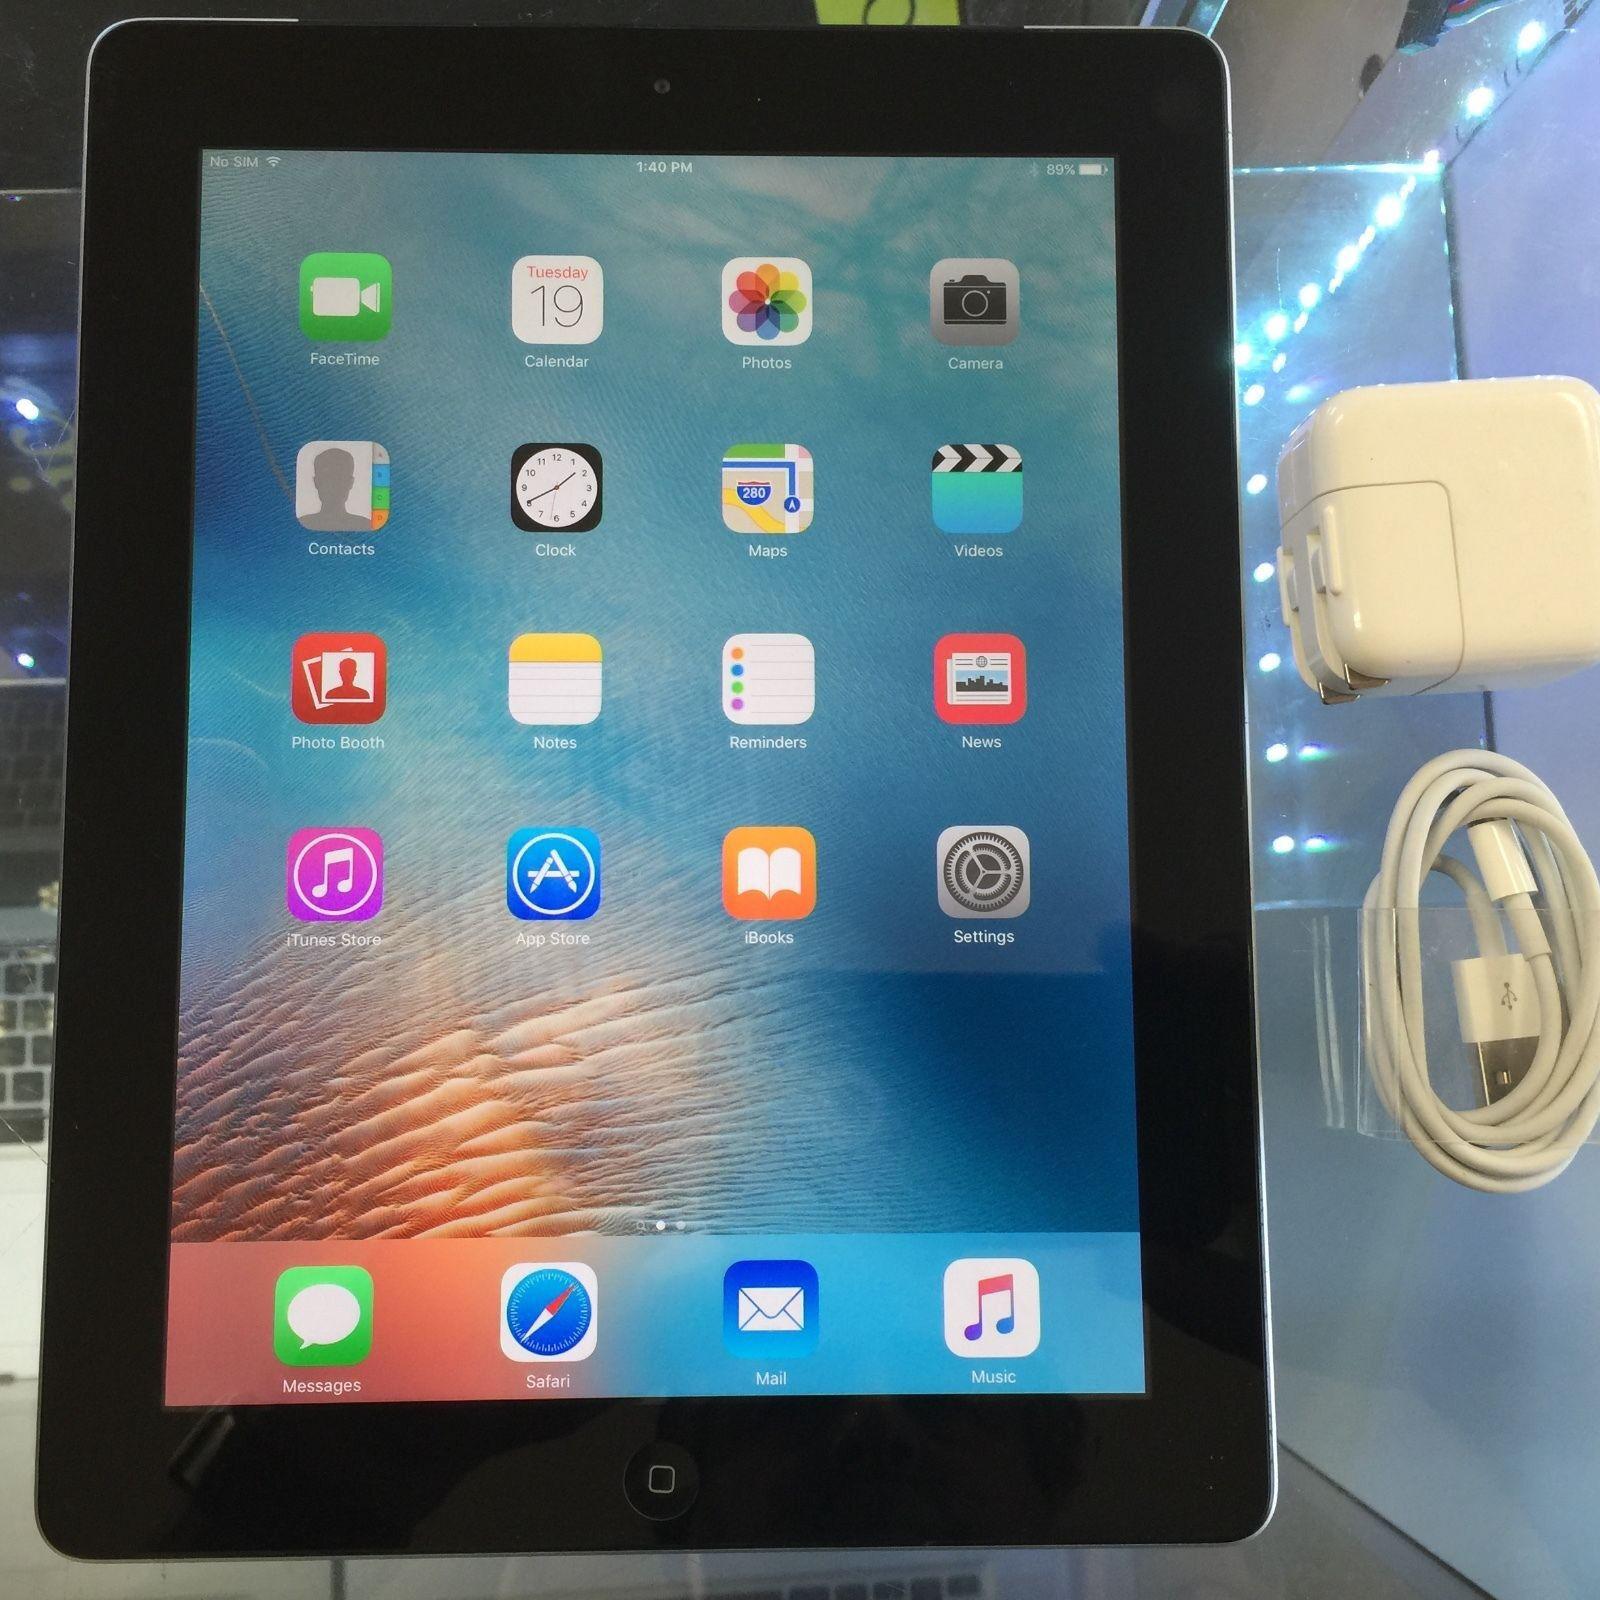 Apple iPad 4 4th Generation 16GB | Wi-Fi | 9.7 inches - Black